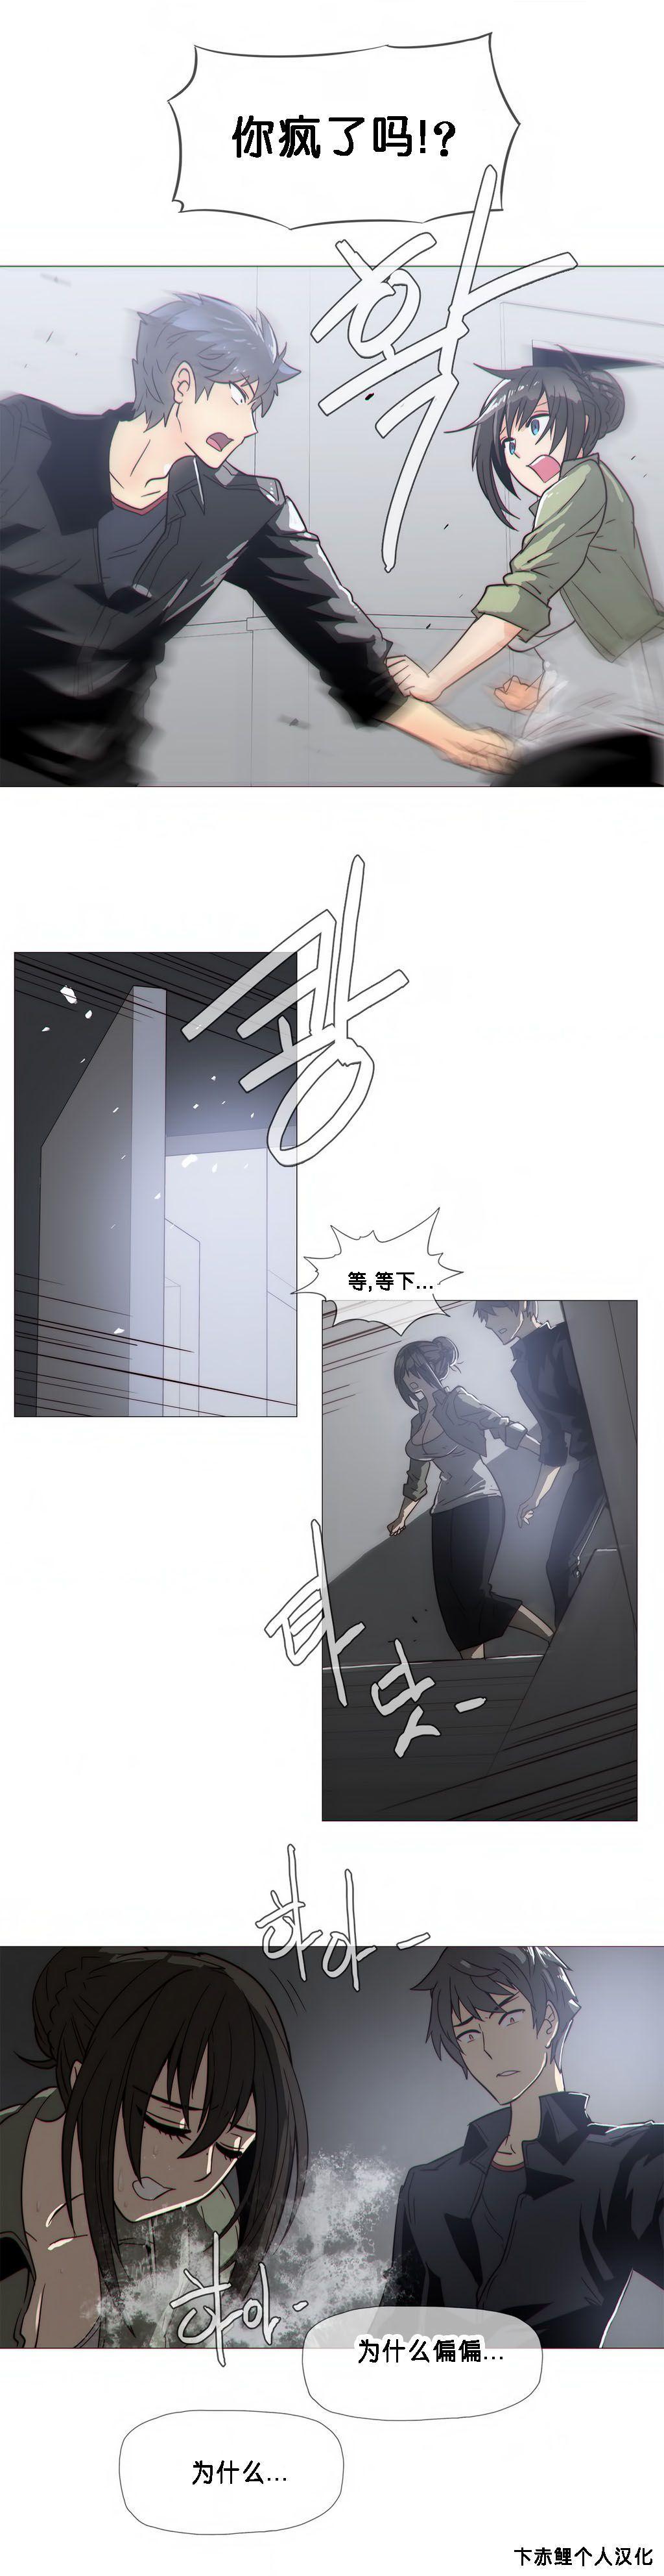 HouseHold Affairs 【卞赤鲤个人汉化】1~33话(持续更新中) 469